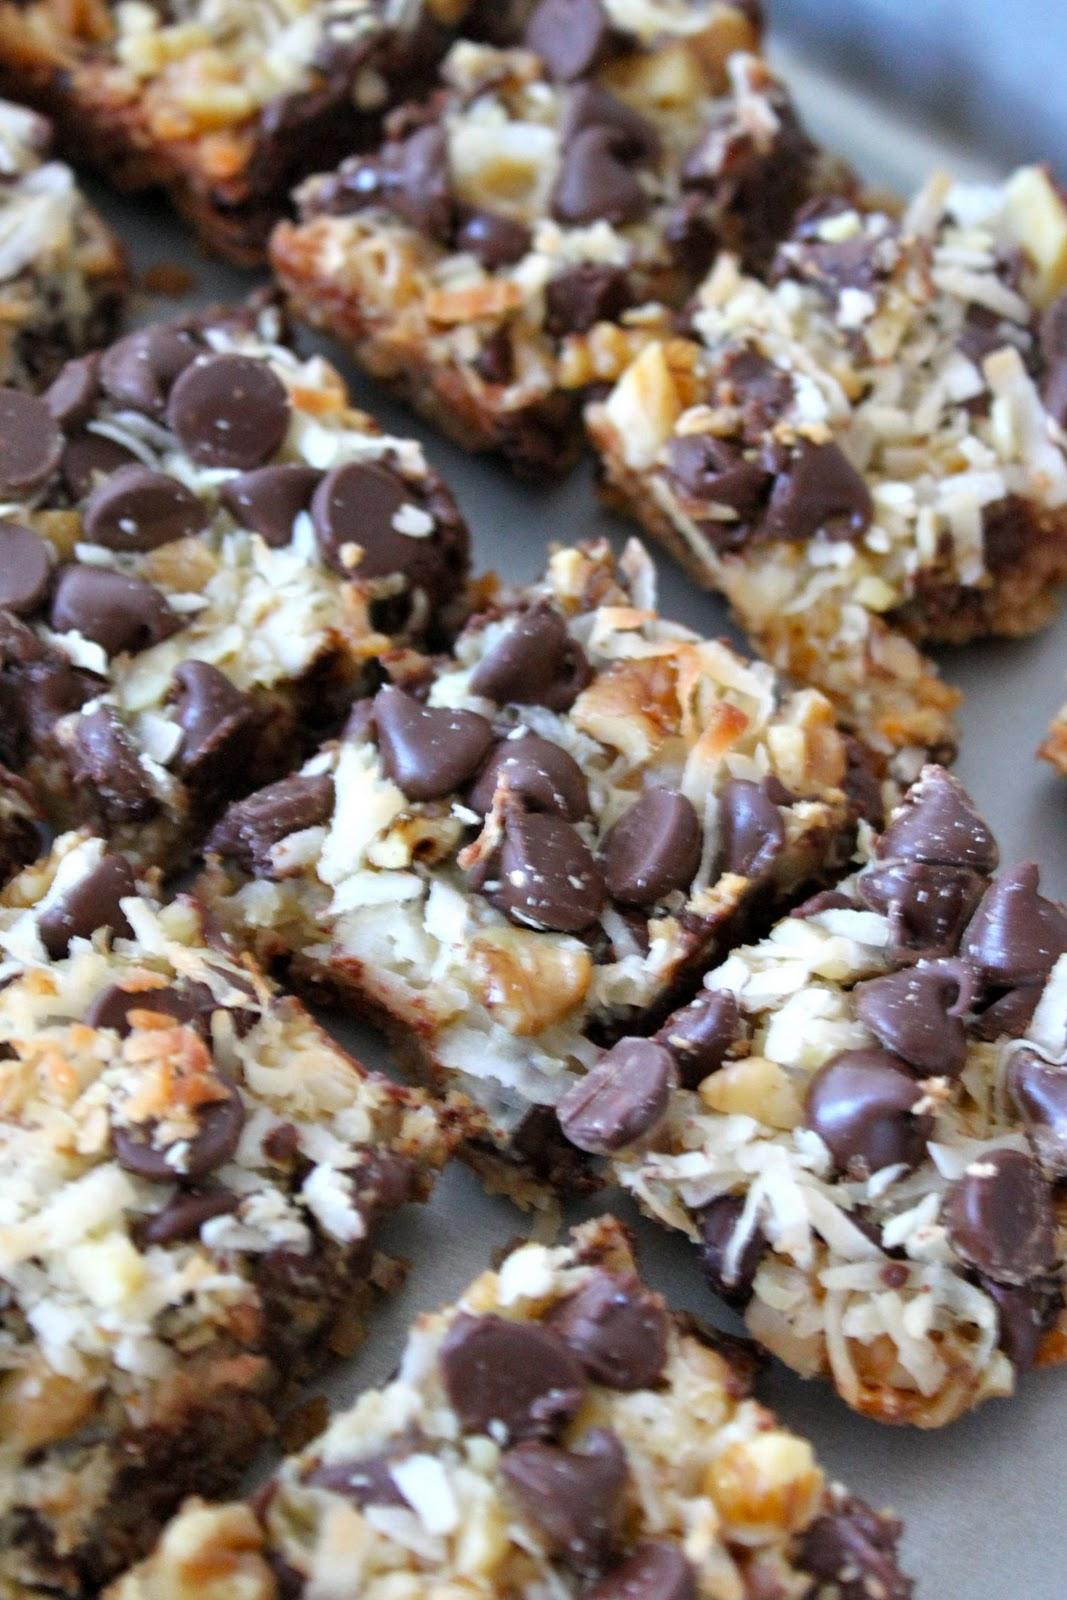 Recipe #10: Magic Cookie Bars – Home at the WhackyShack